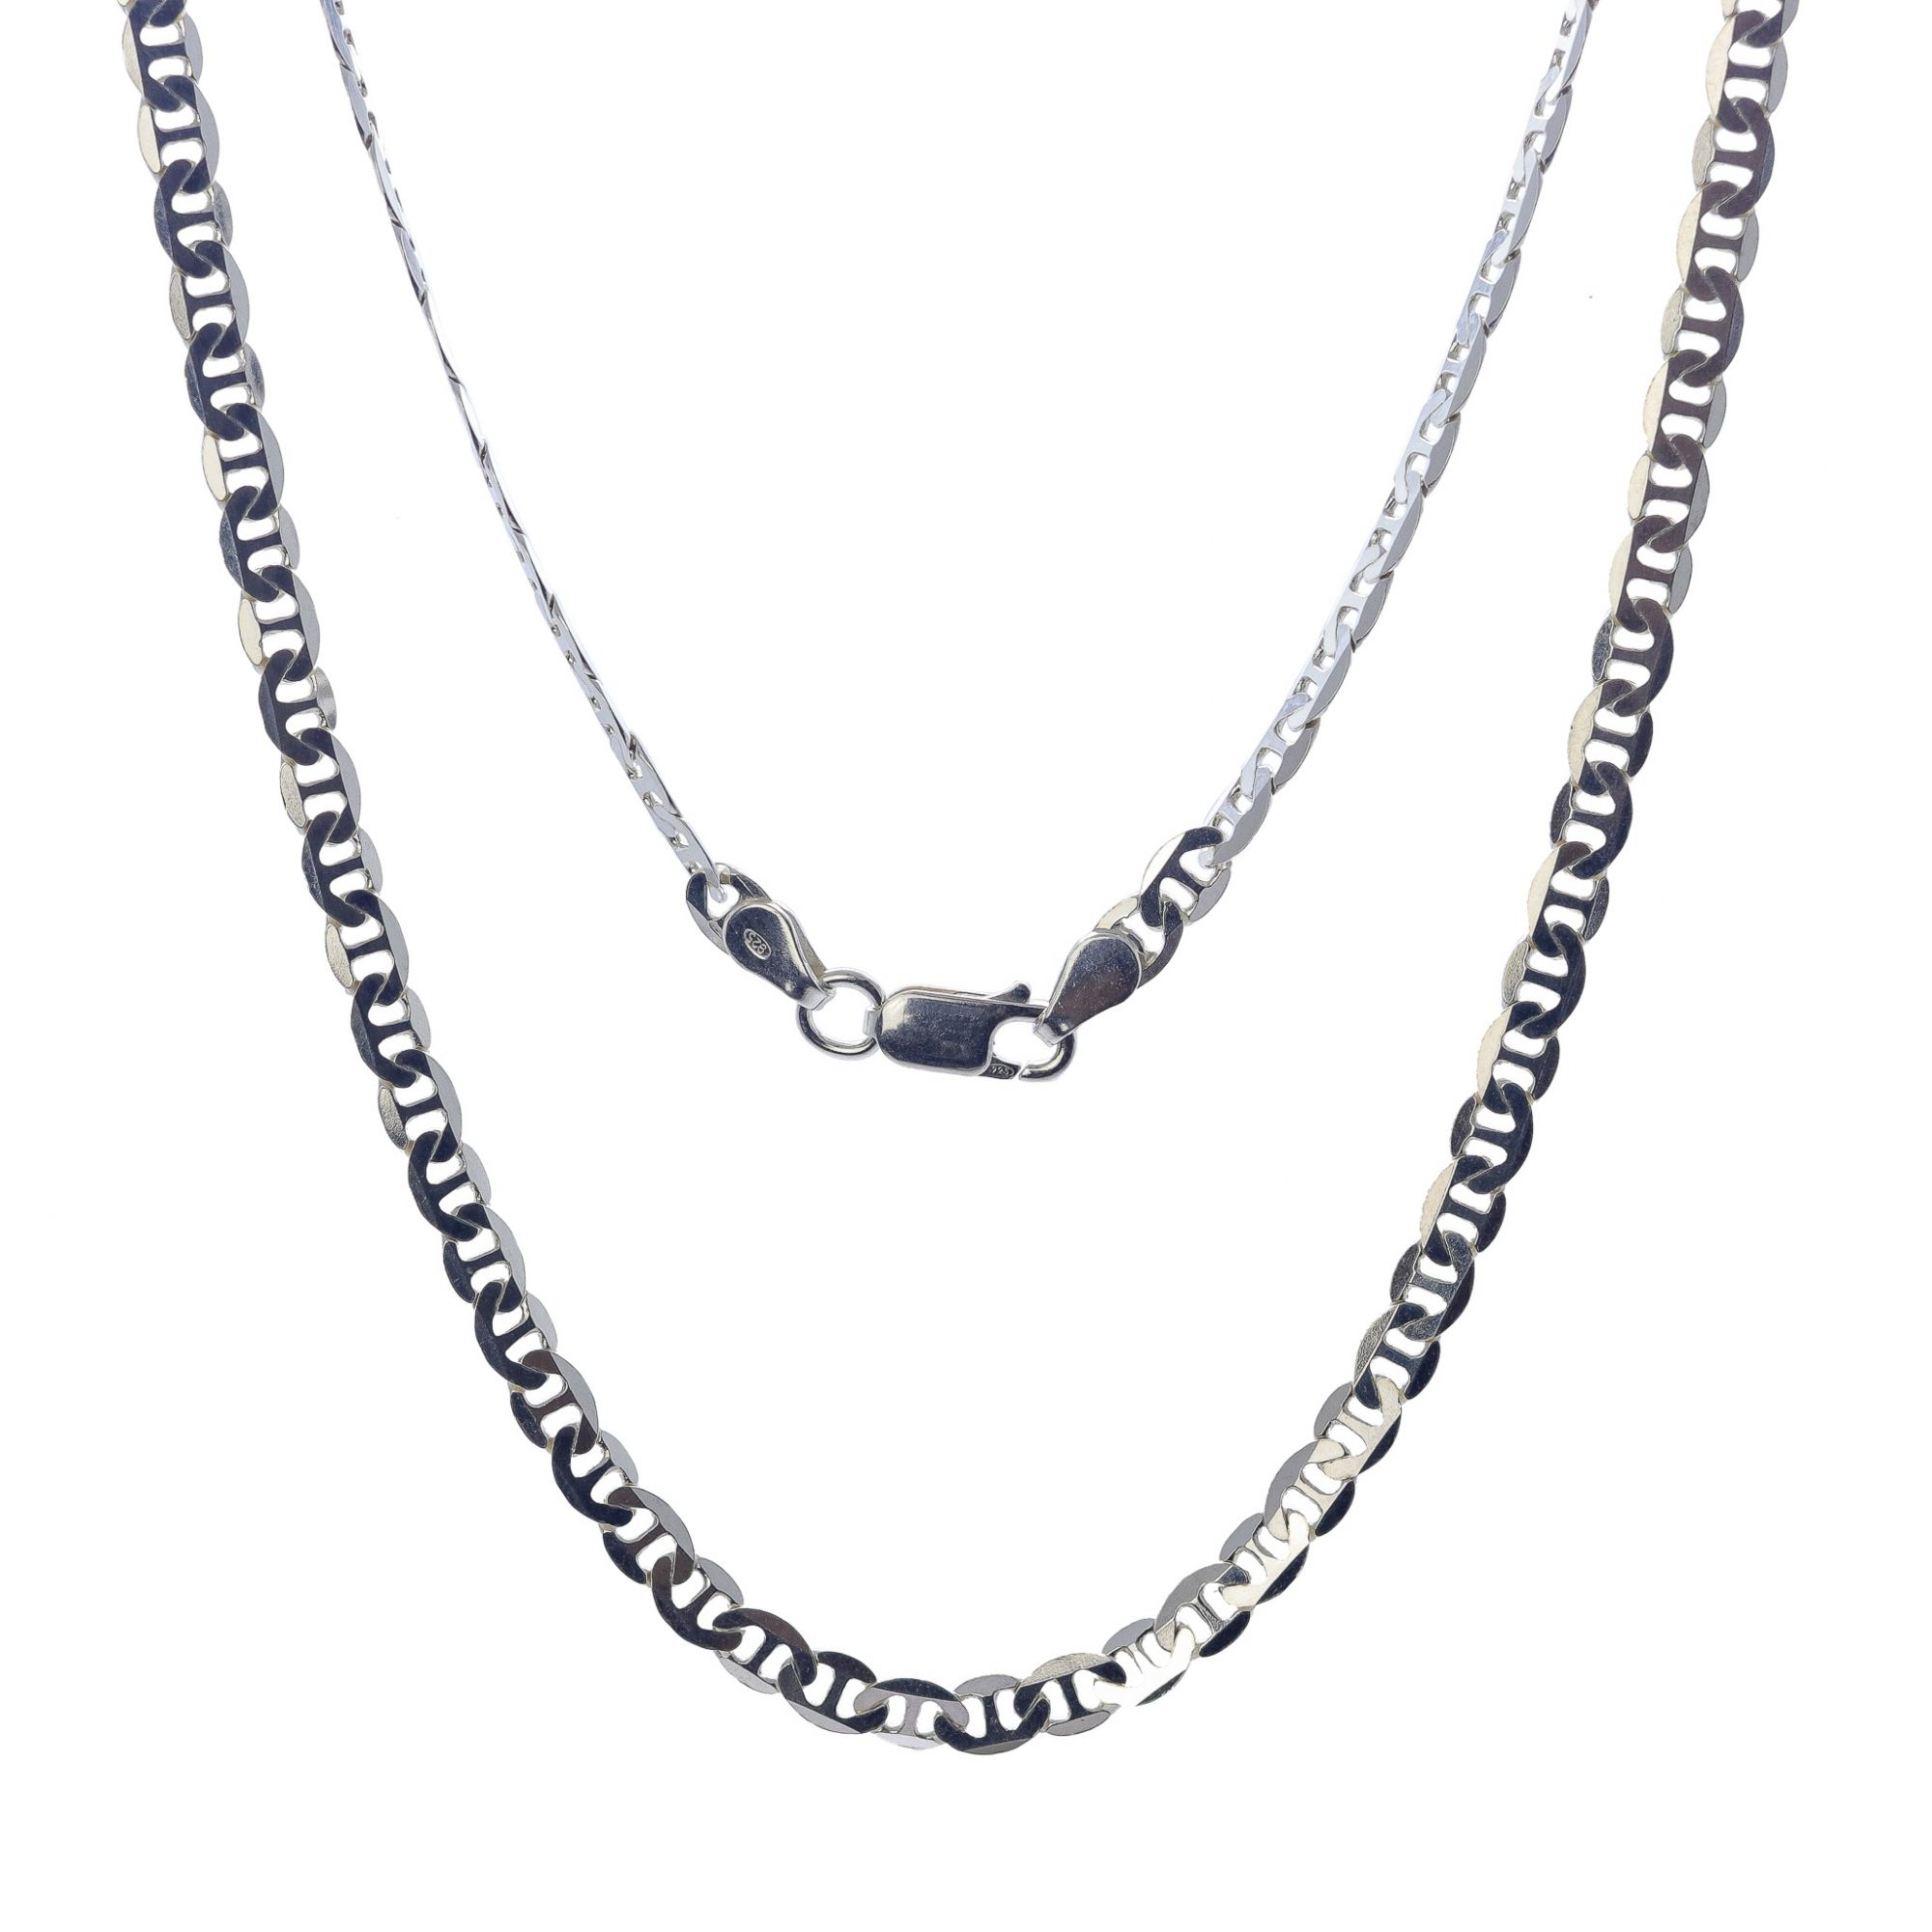 Corrente prata 925 piastrine